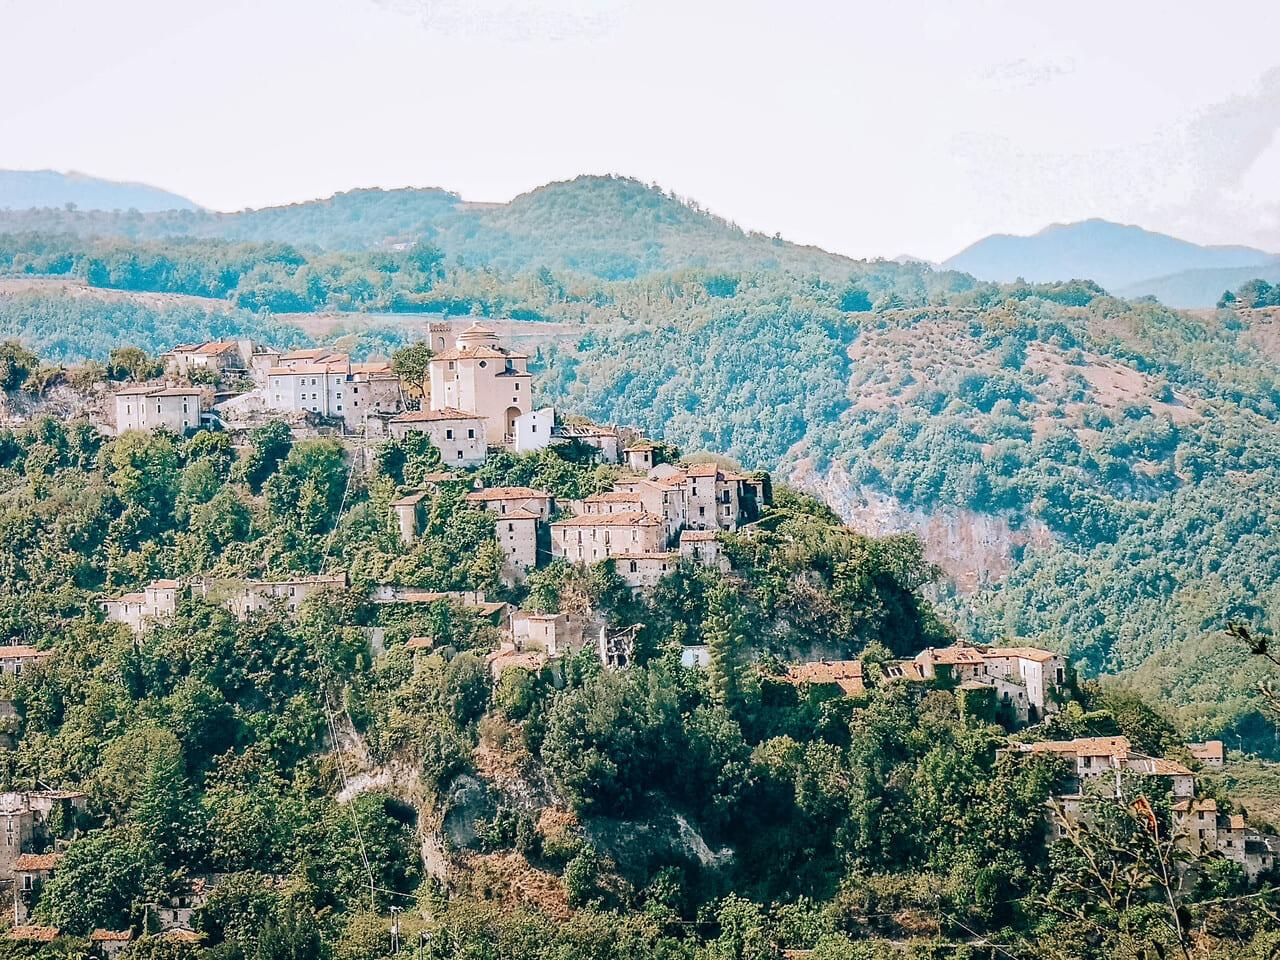 laino castello vecchio